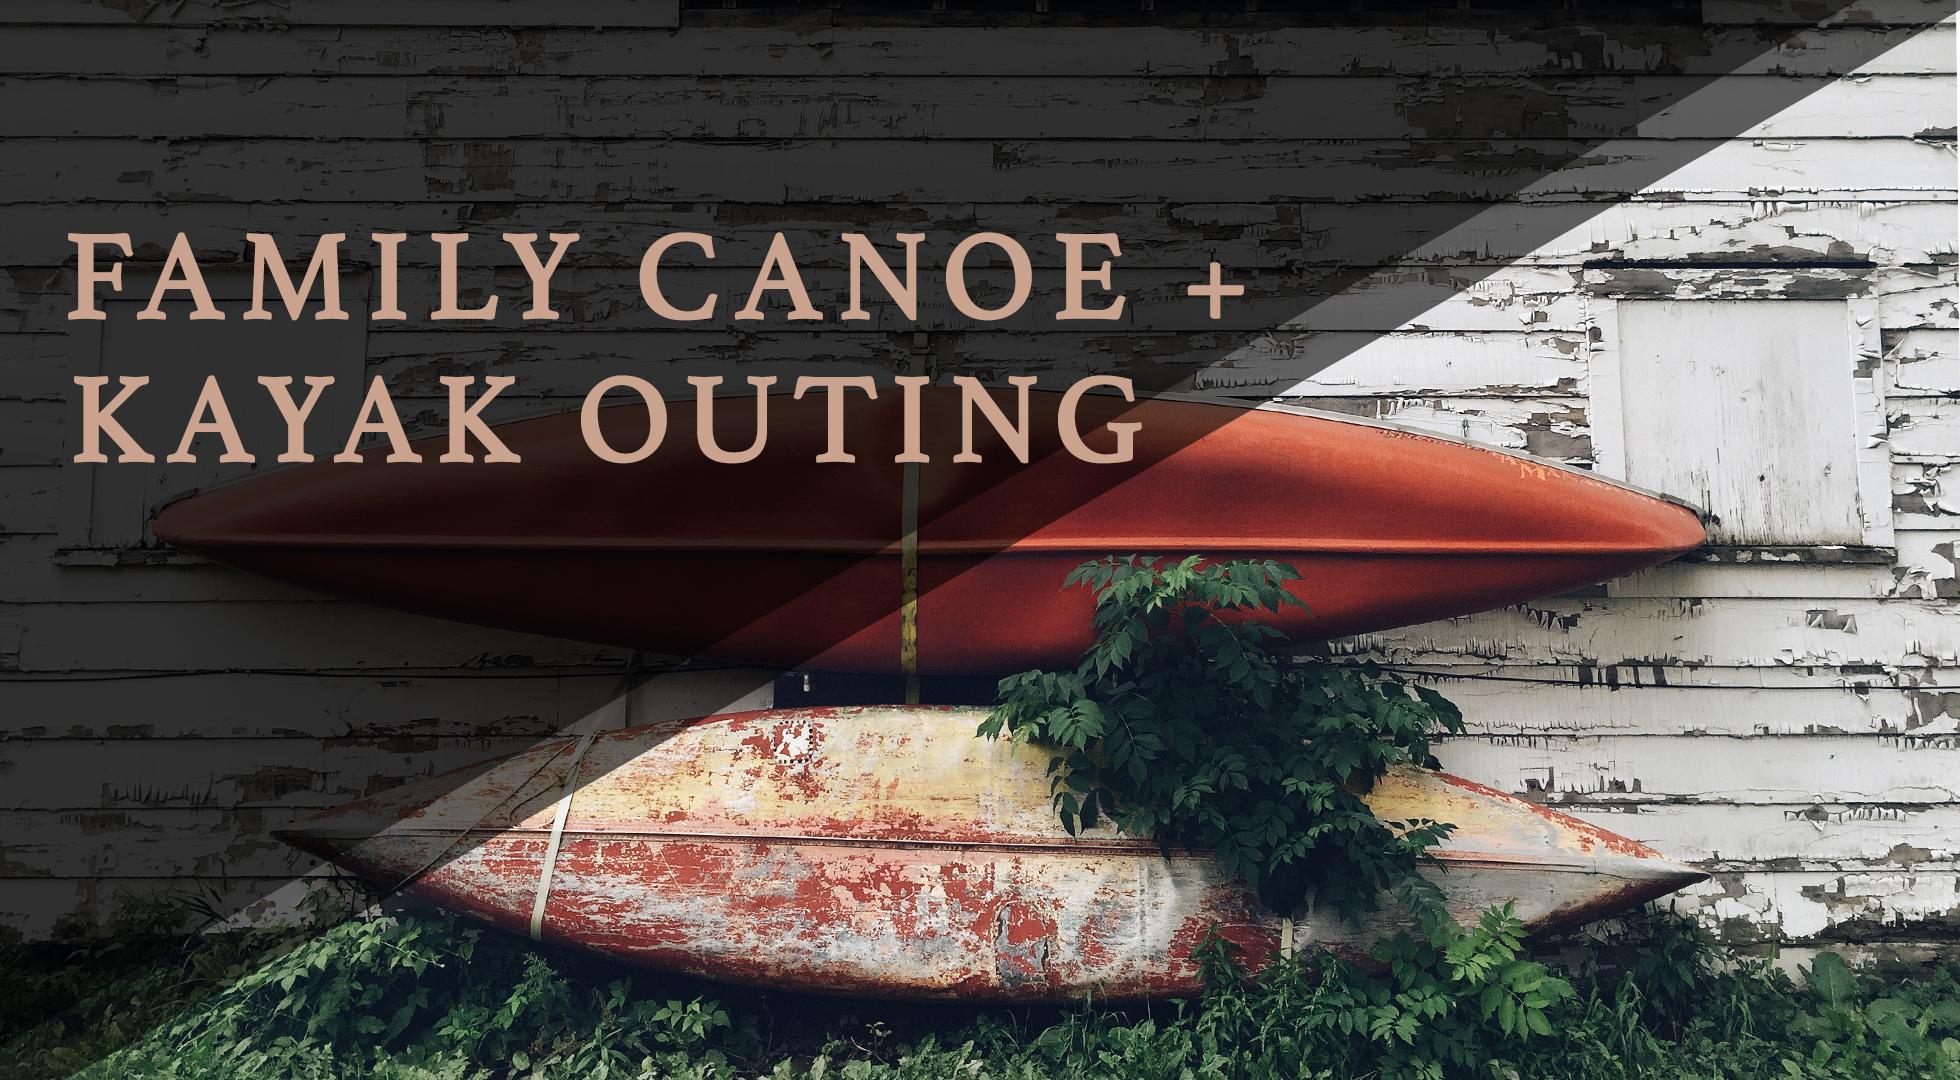 Family Canoe Kayak Outing Vineyard Church.jpg